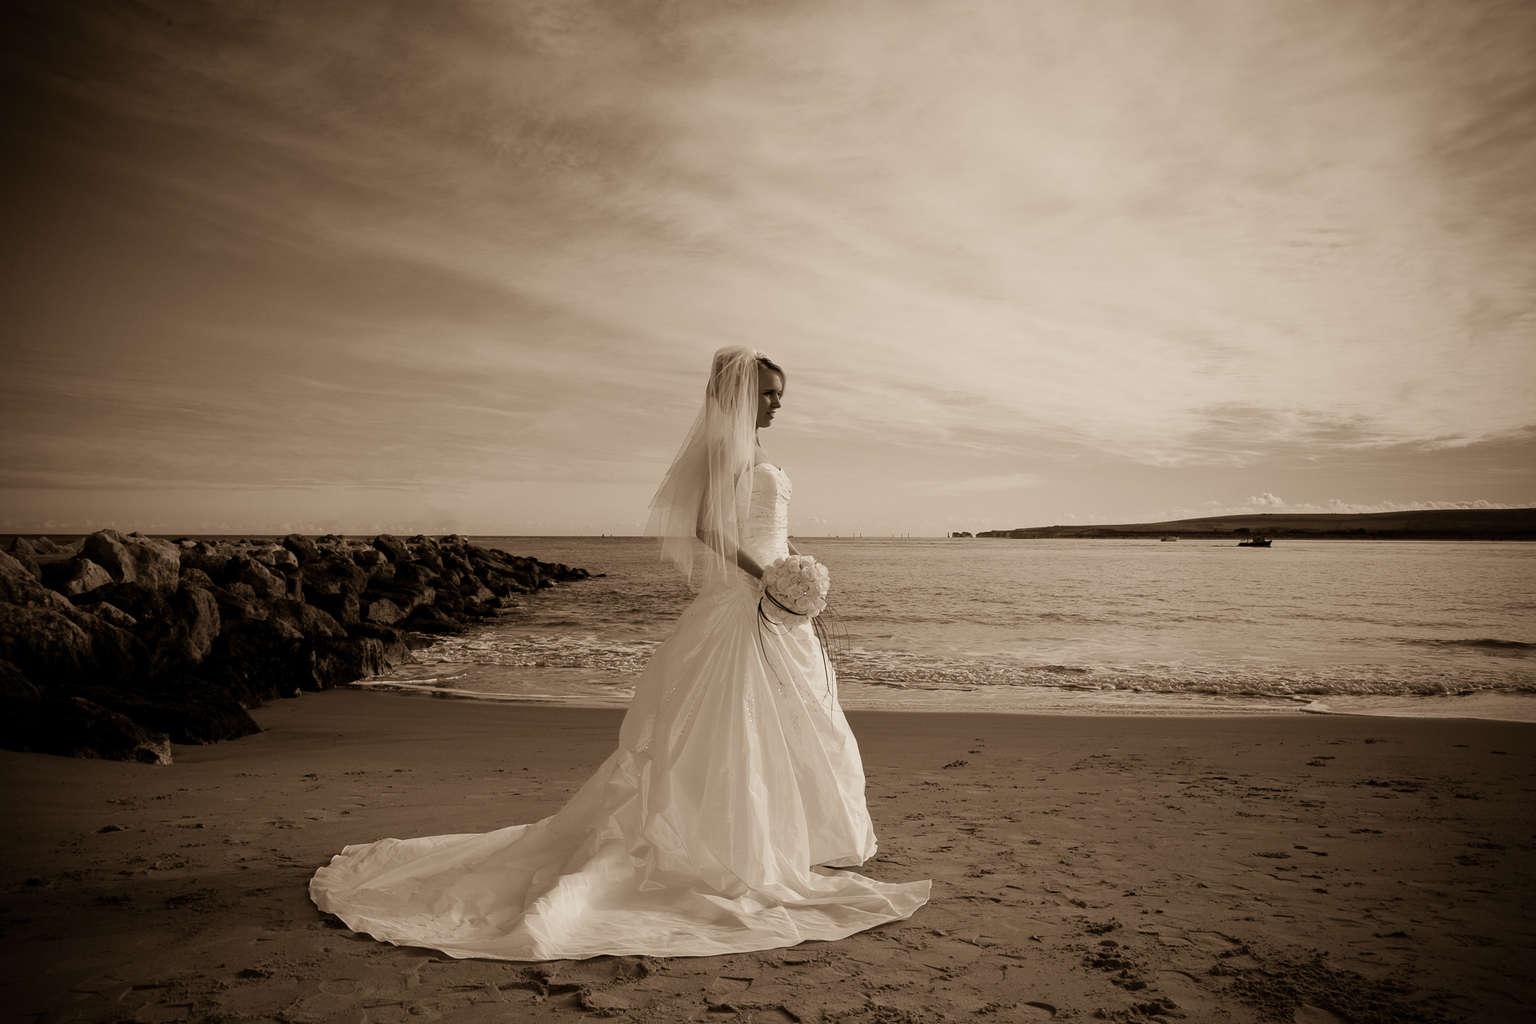 poole beach wedding photographer